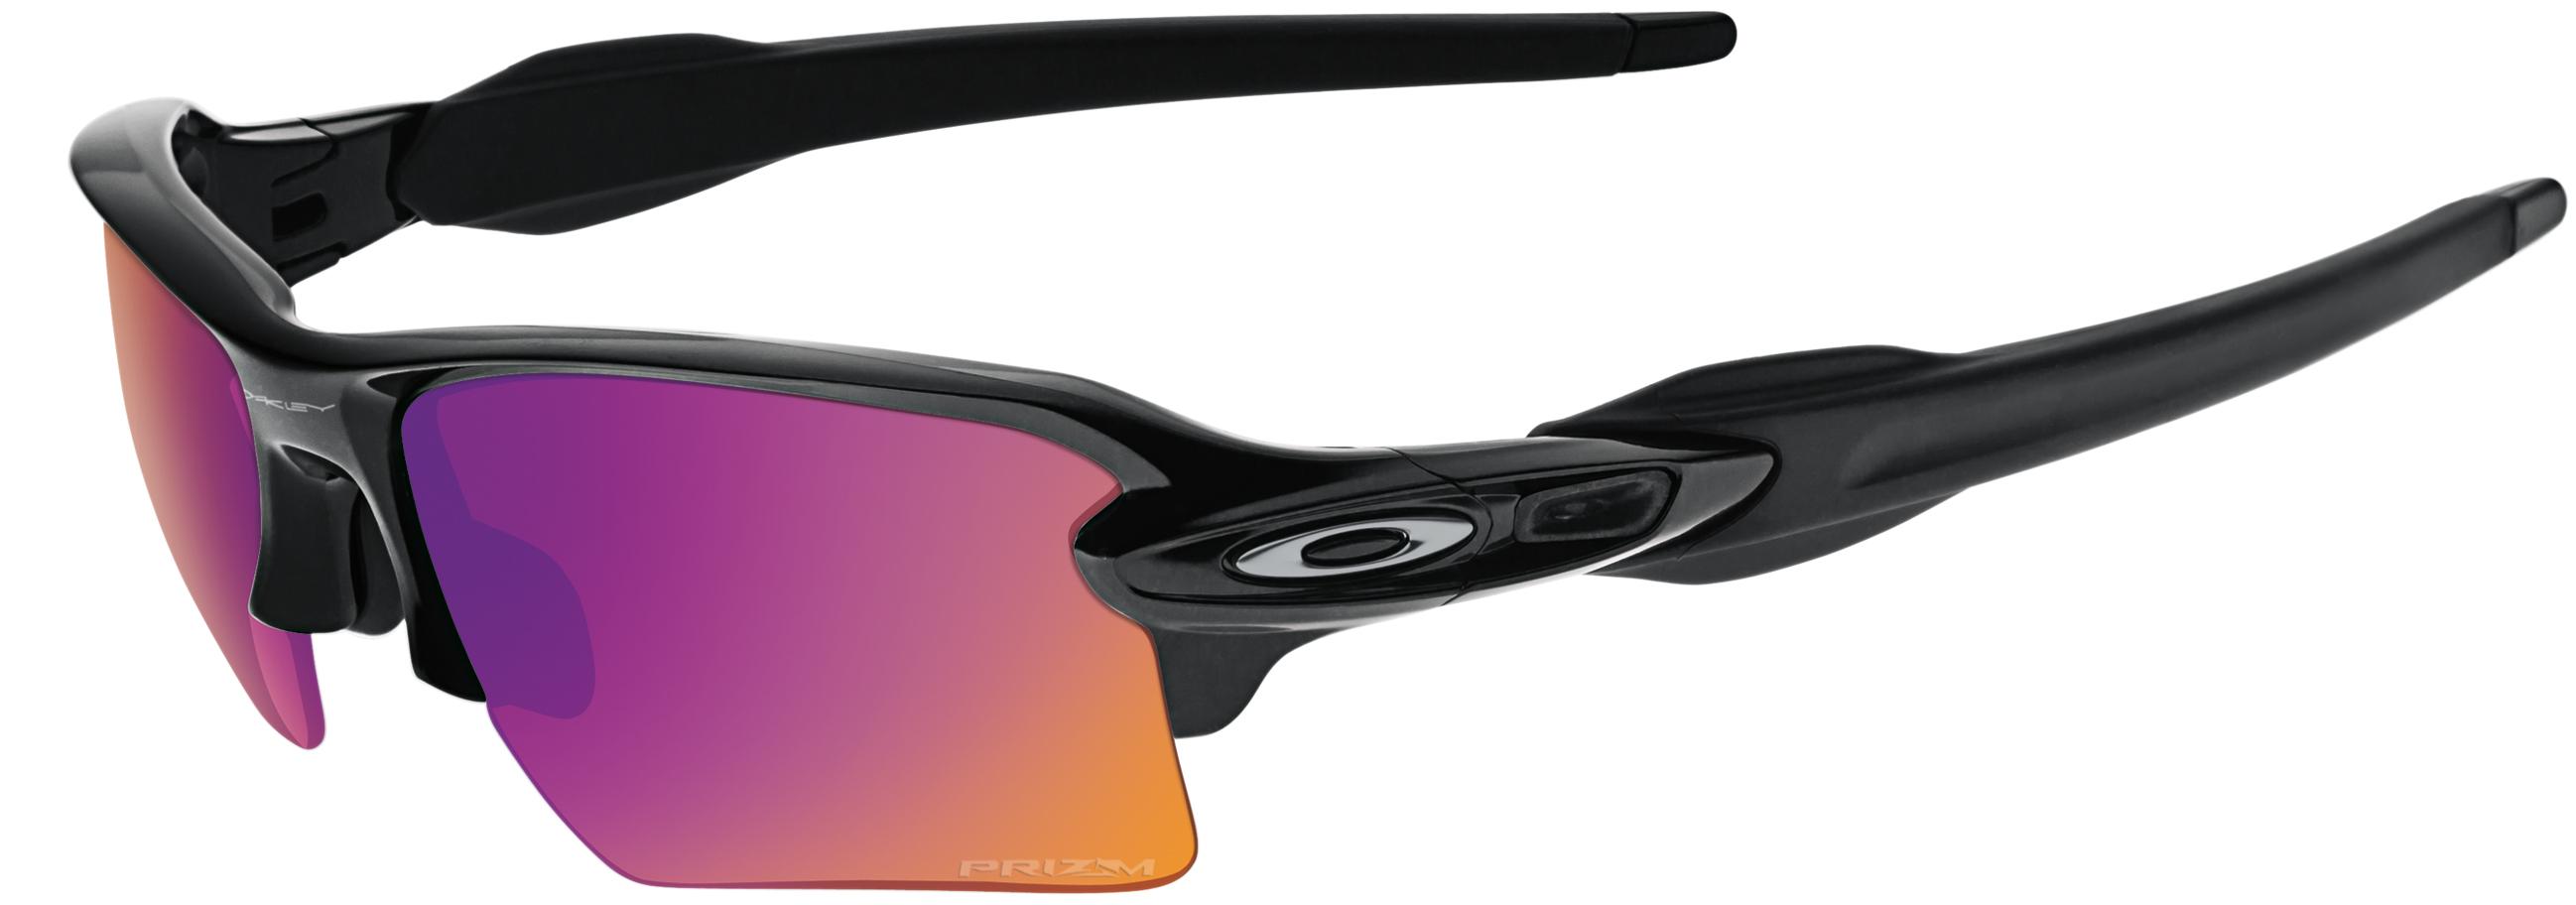 22b0b4d0cb Oakley Flak 2.0 XL Sunglasses - Unisex